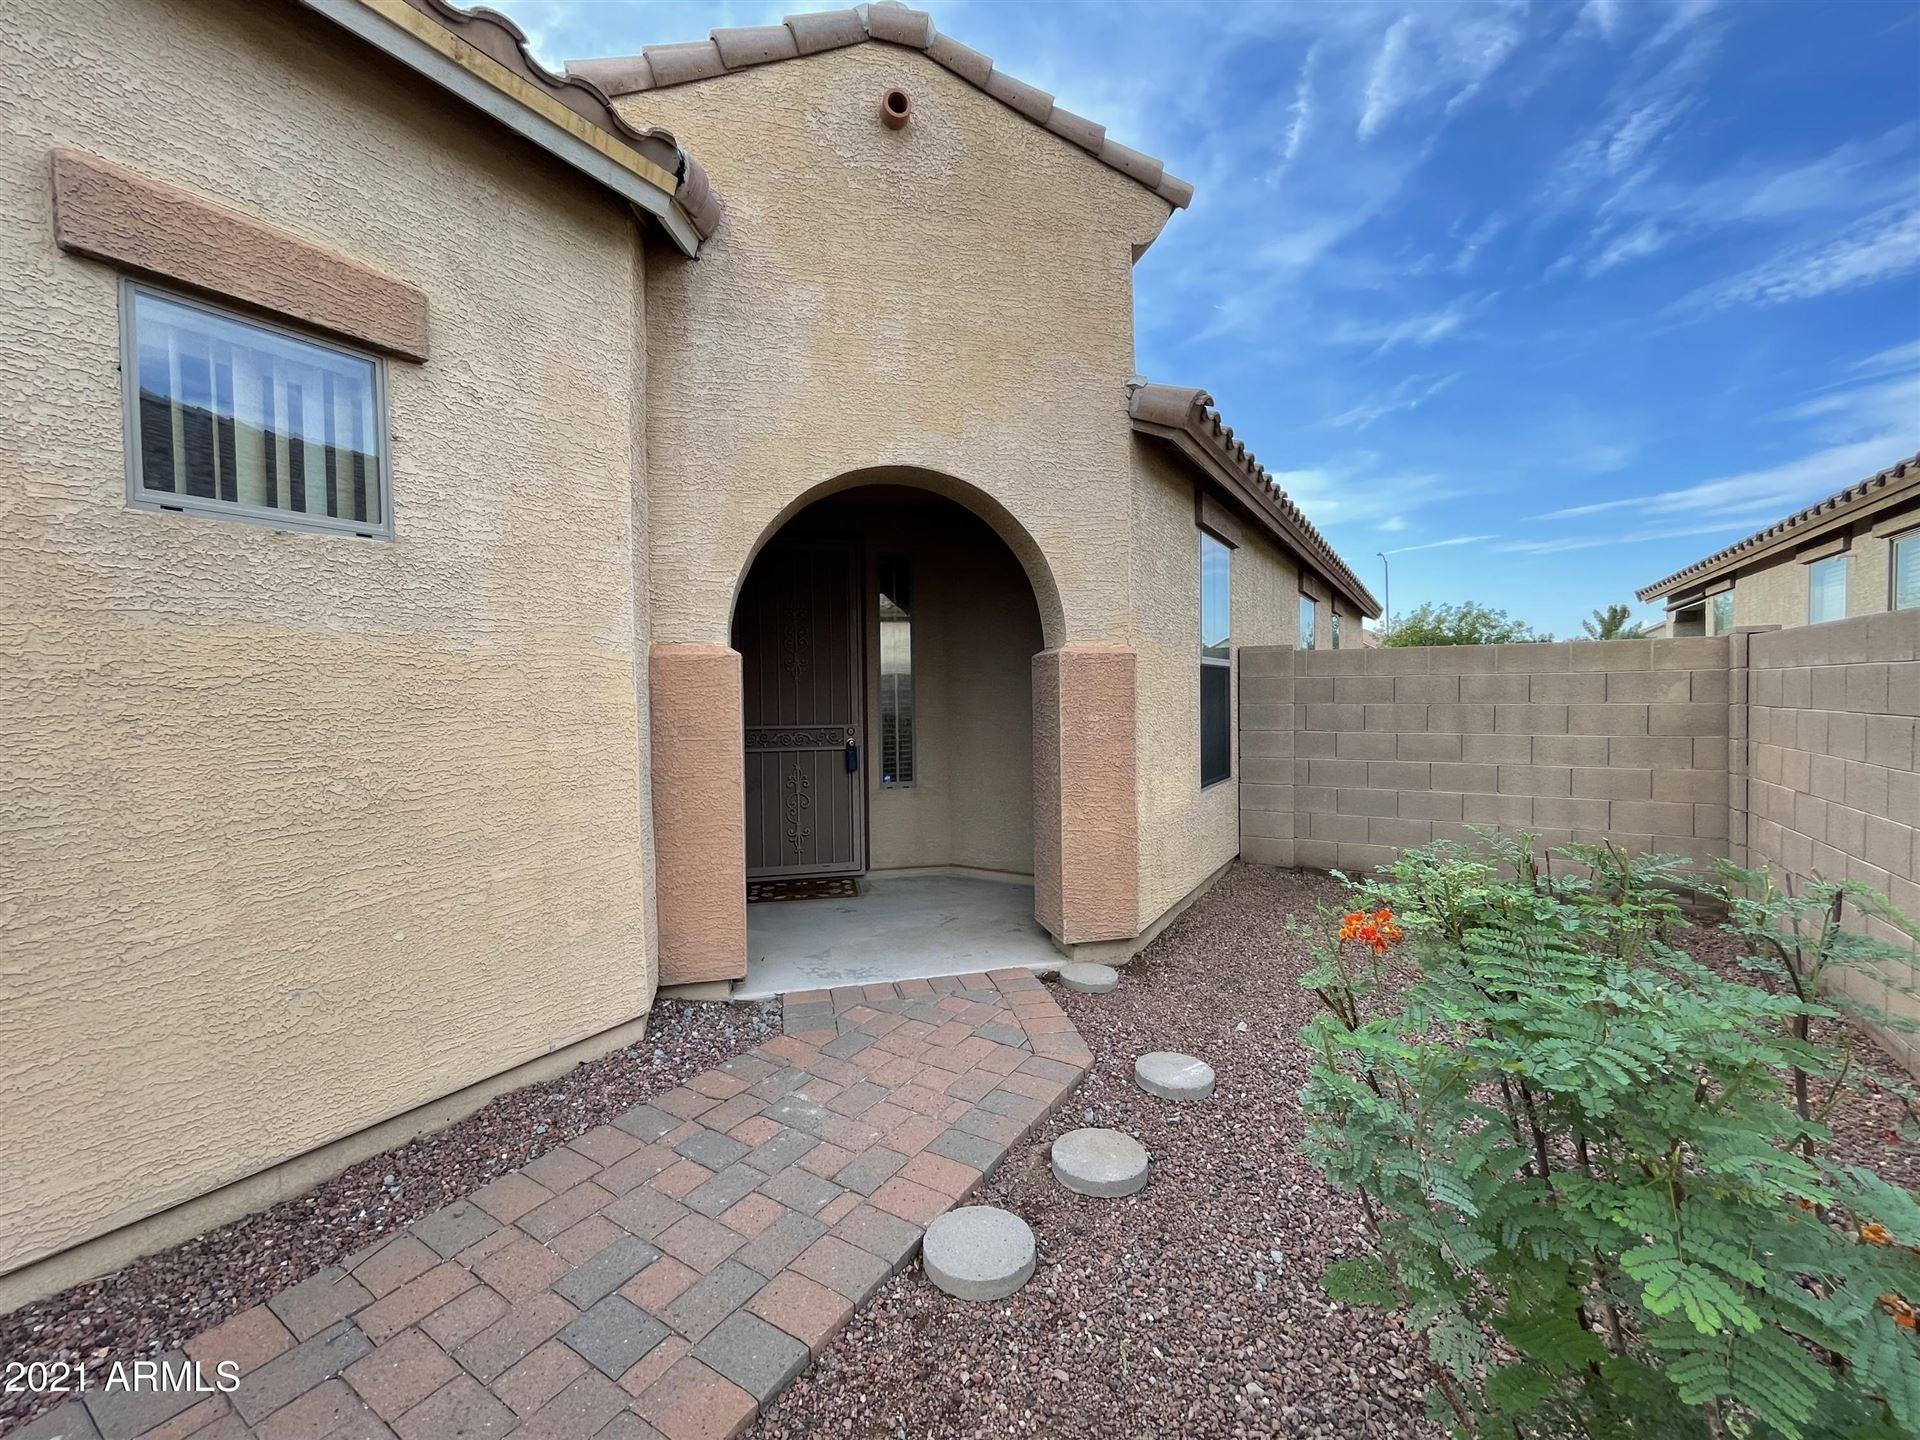 Photo of 10114 W PAYSON Road, Tolleson, AZ 85353 (MLS # 6270897)